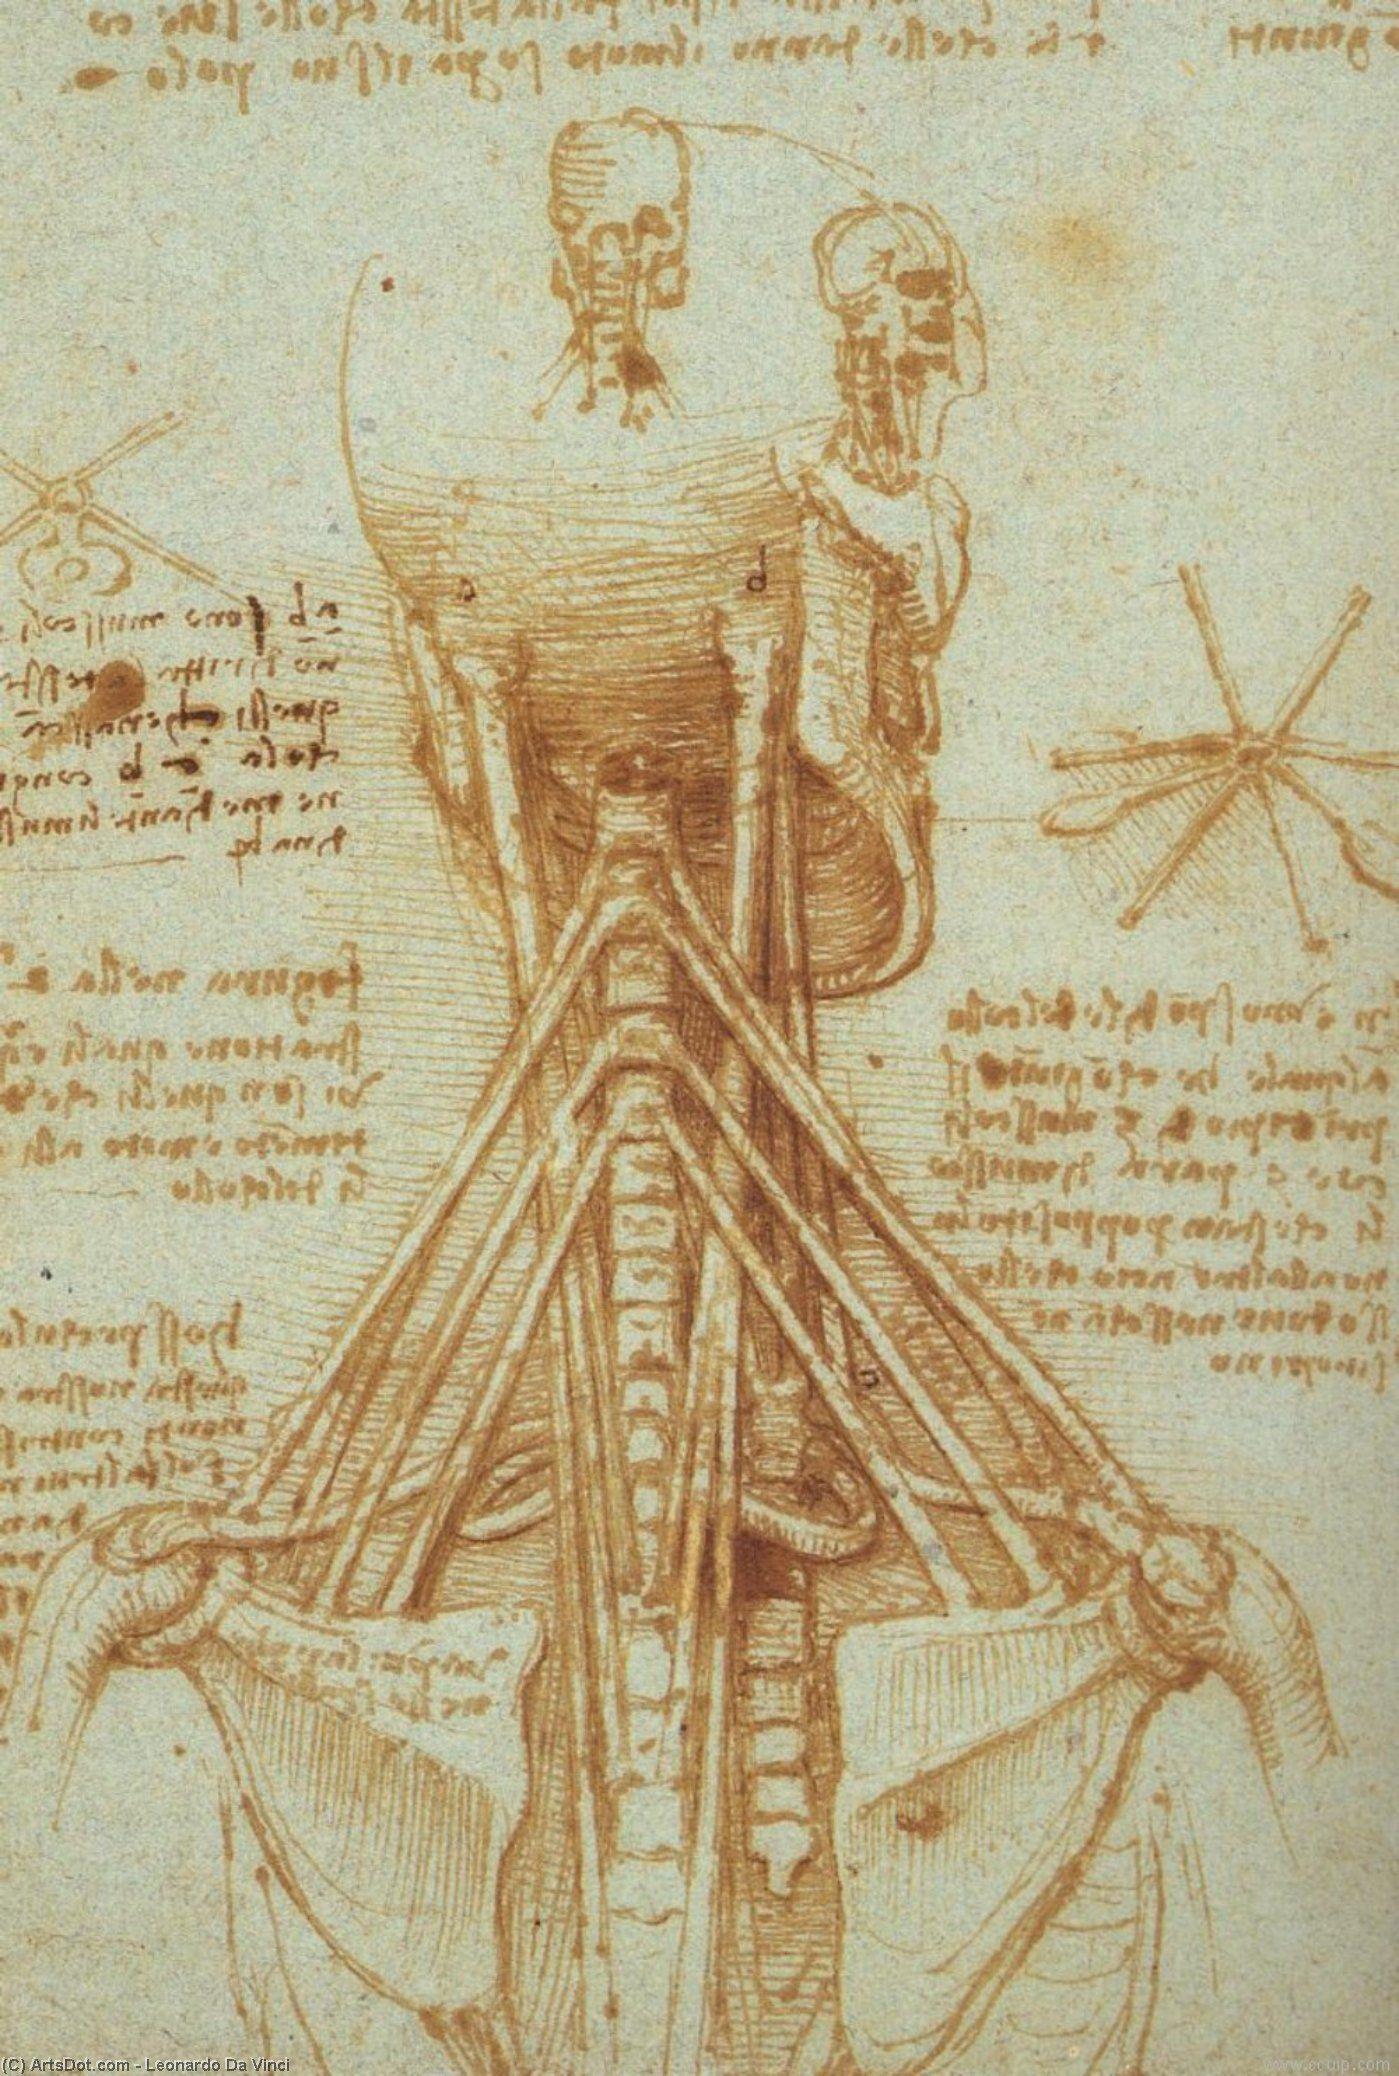 Leonardo Da Vinci-Anatomie du cou | Leonardo Da Vinci | Pinterest ...